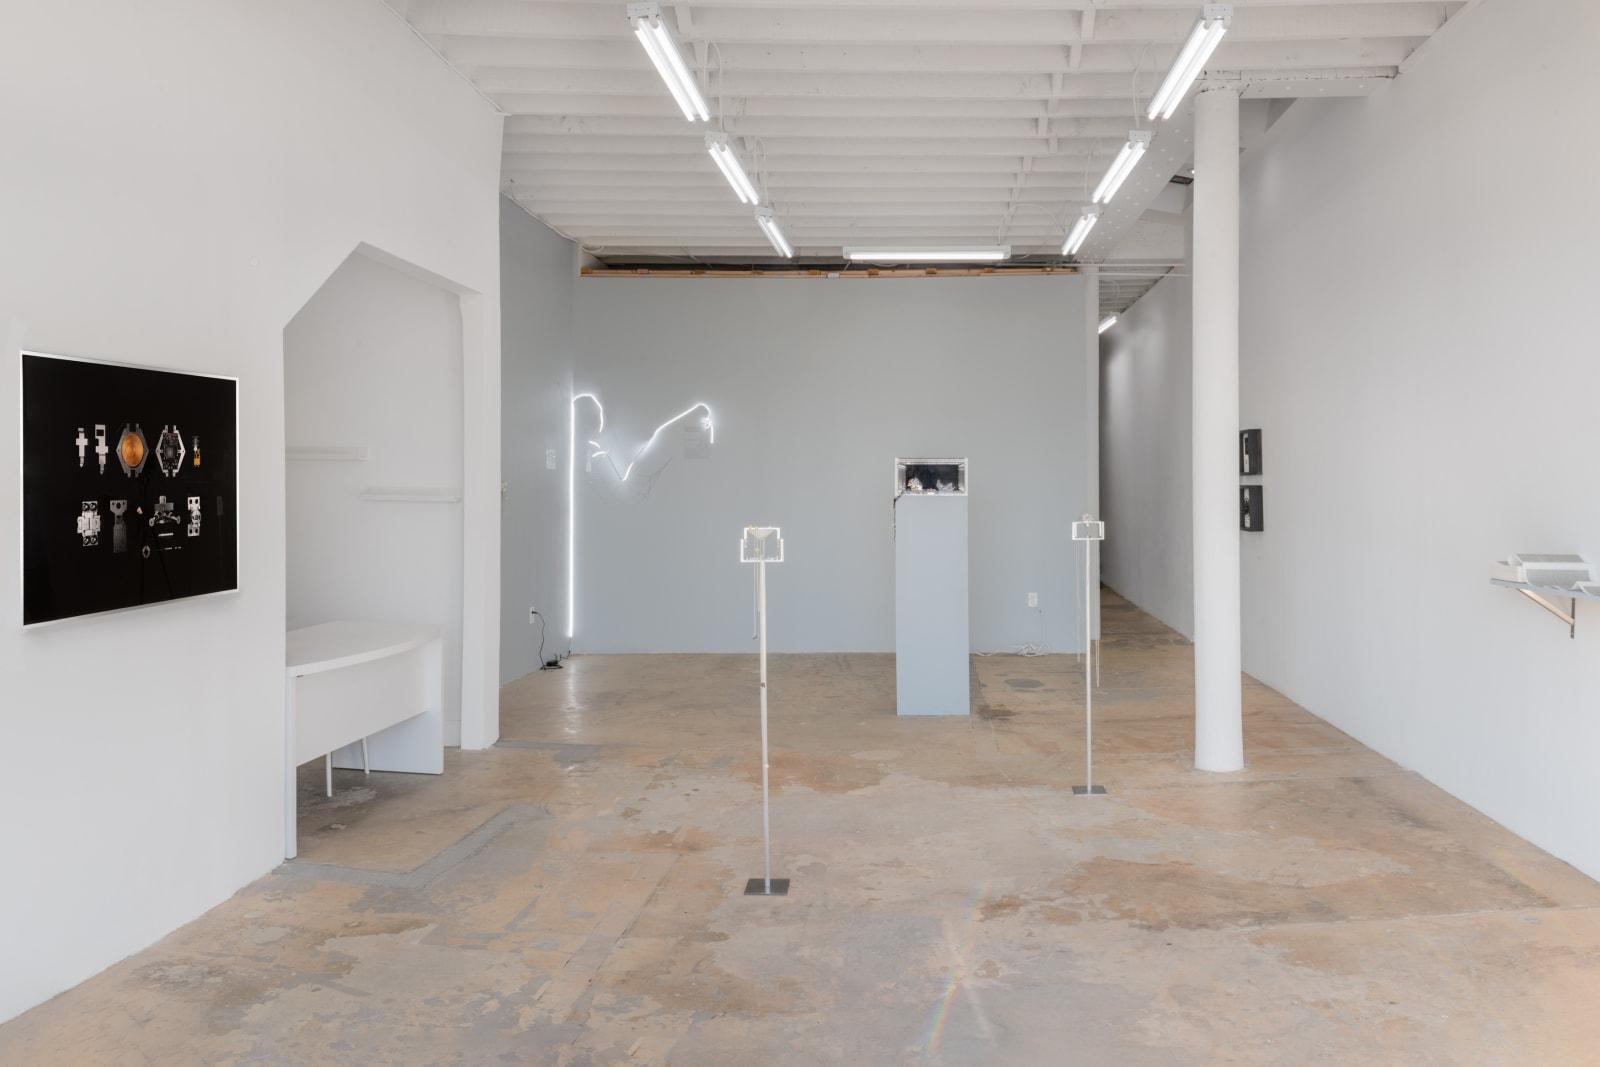 Installation View, Liu Xin: Living Distance, 2019